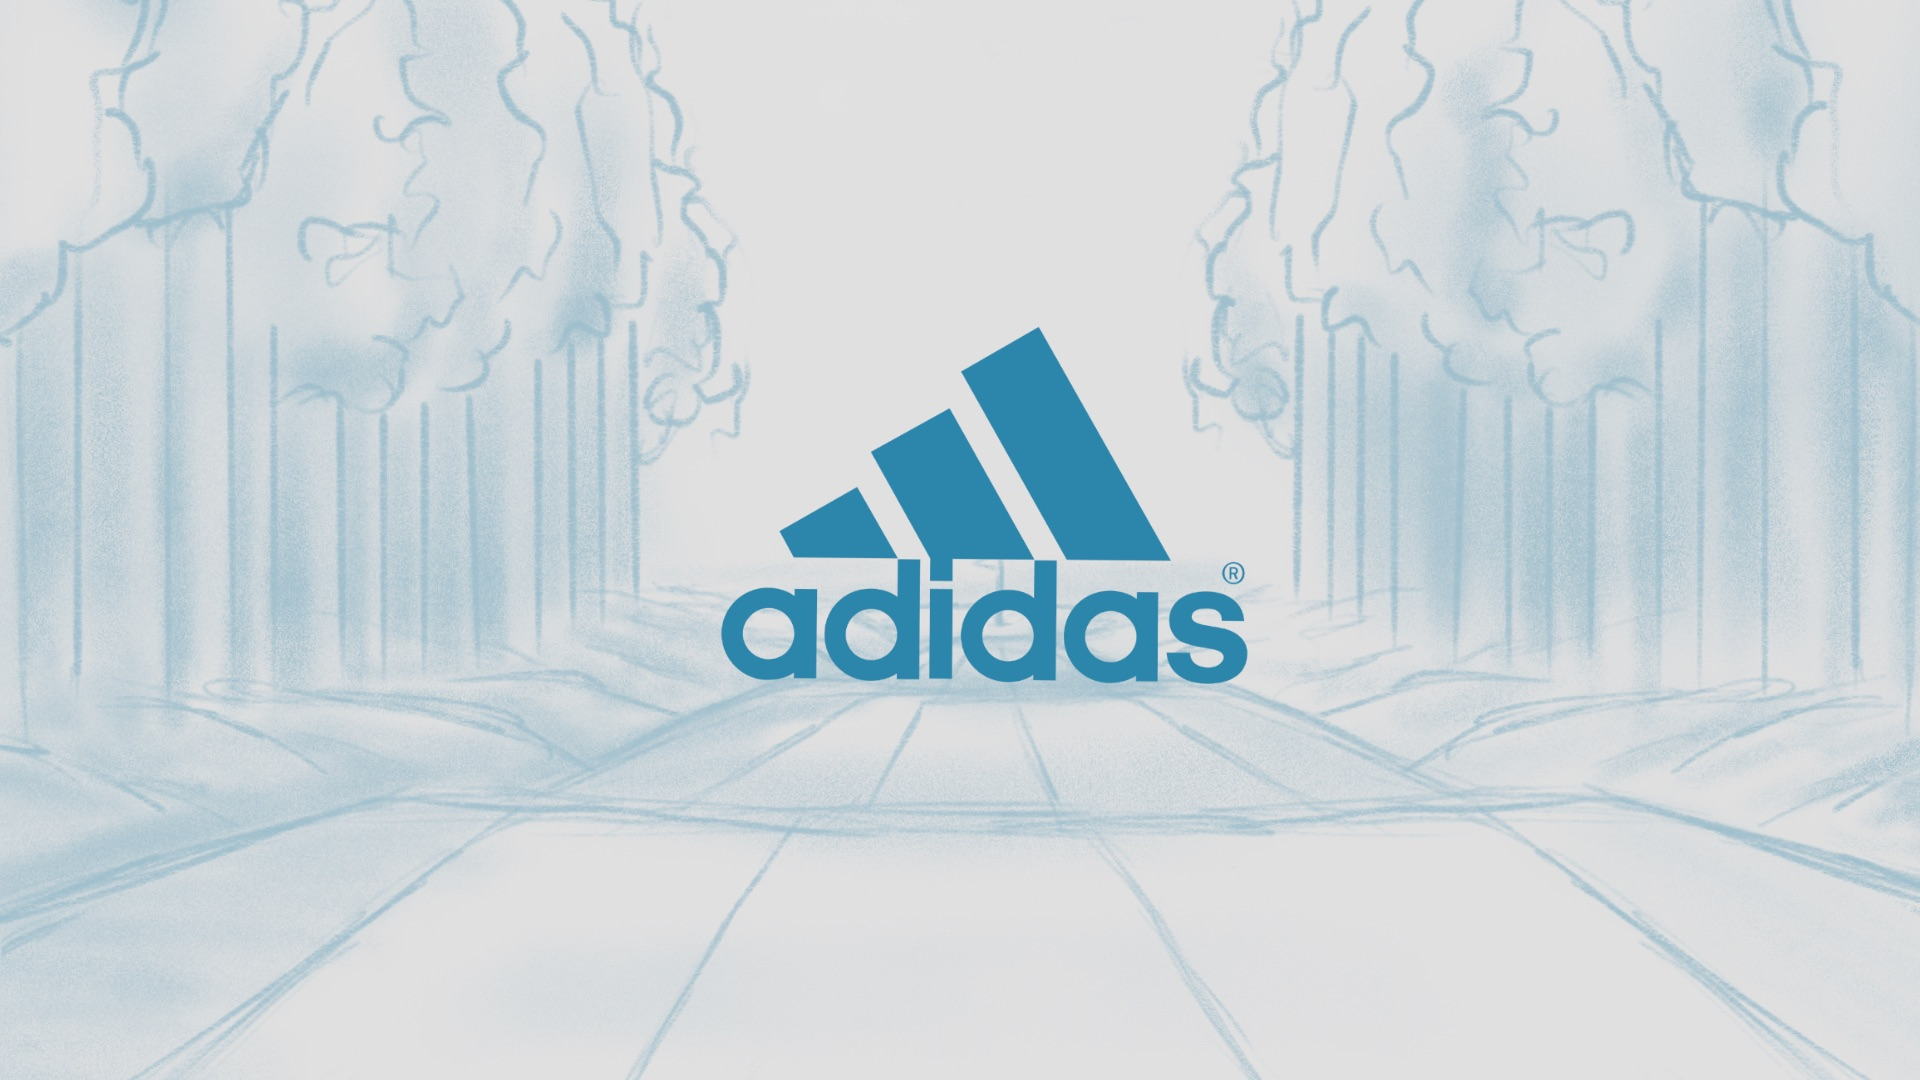 Adidas_outr0_3.PNG